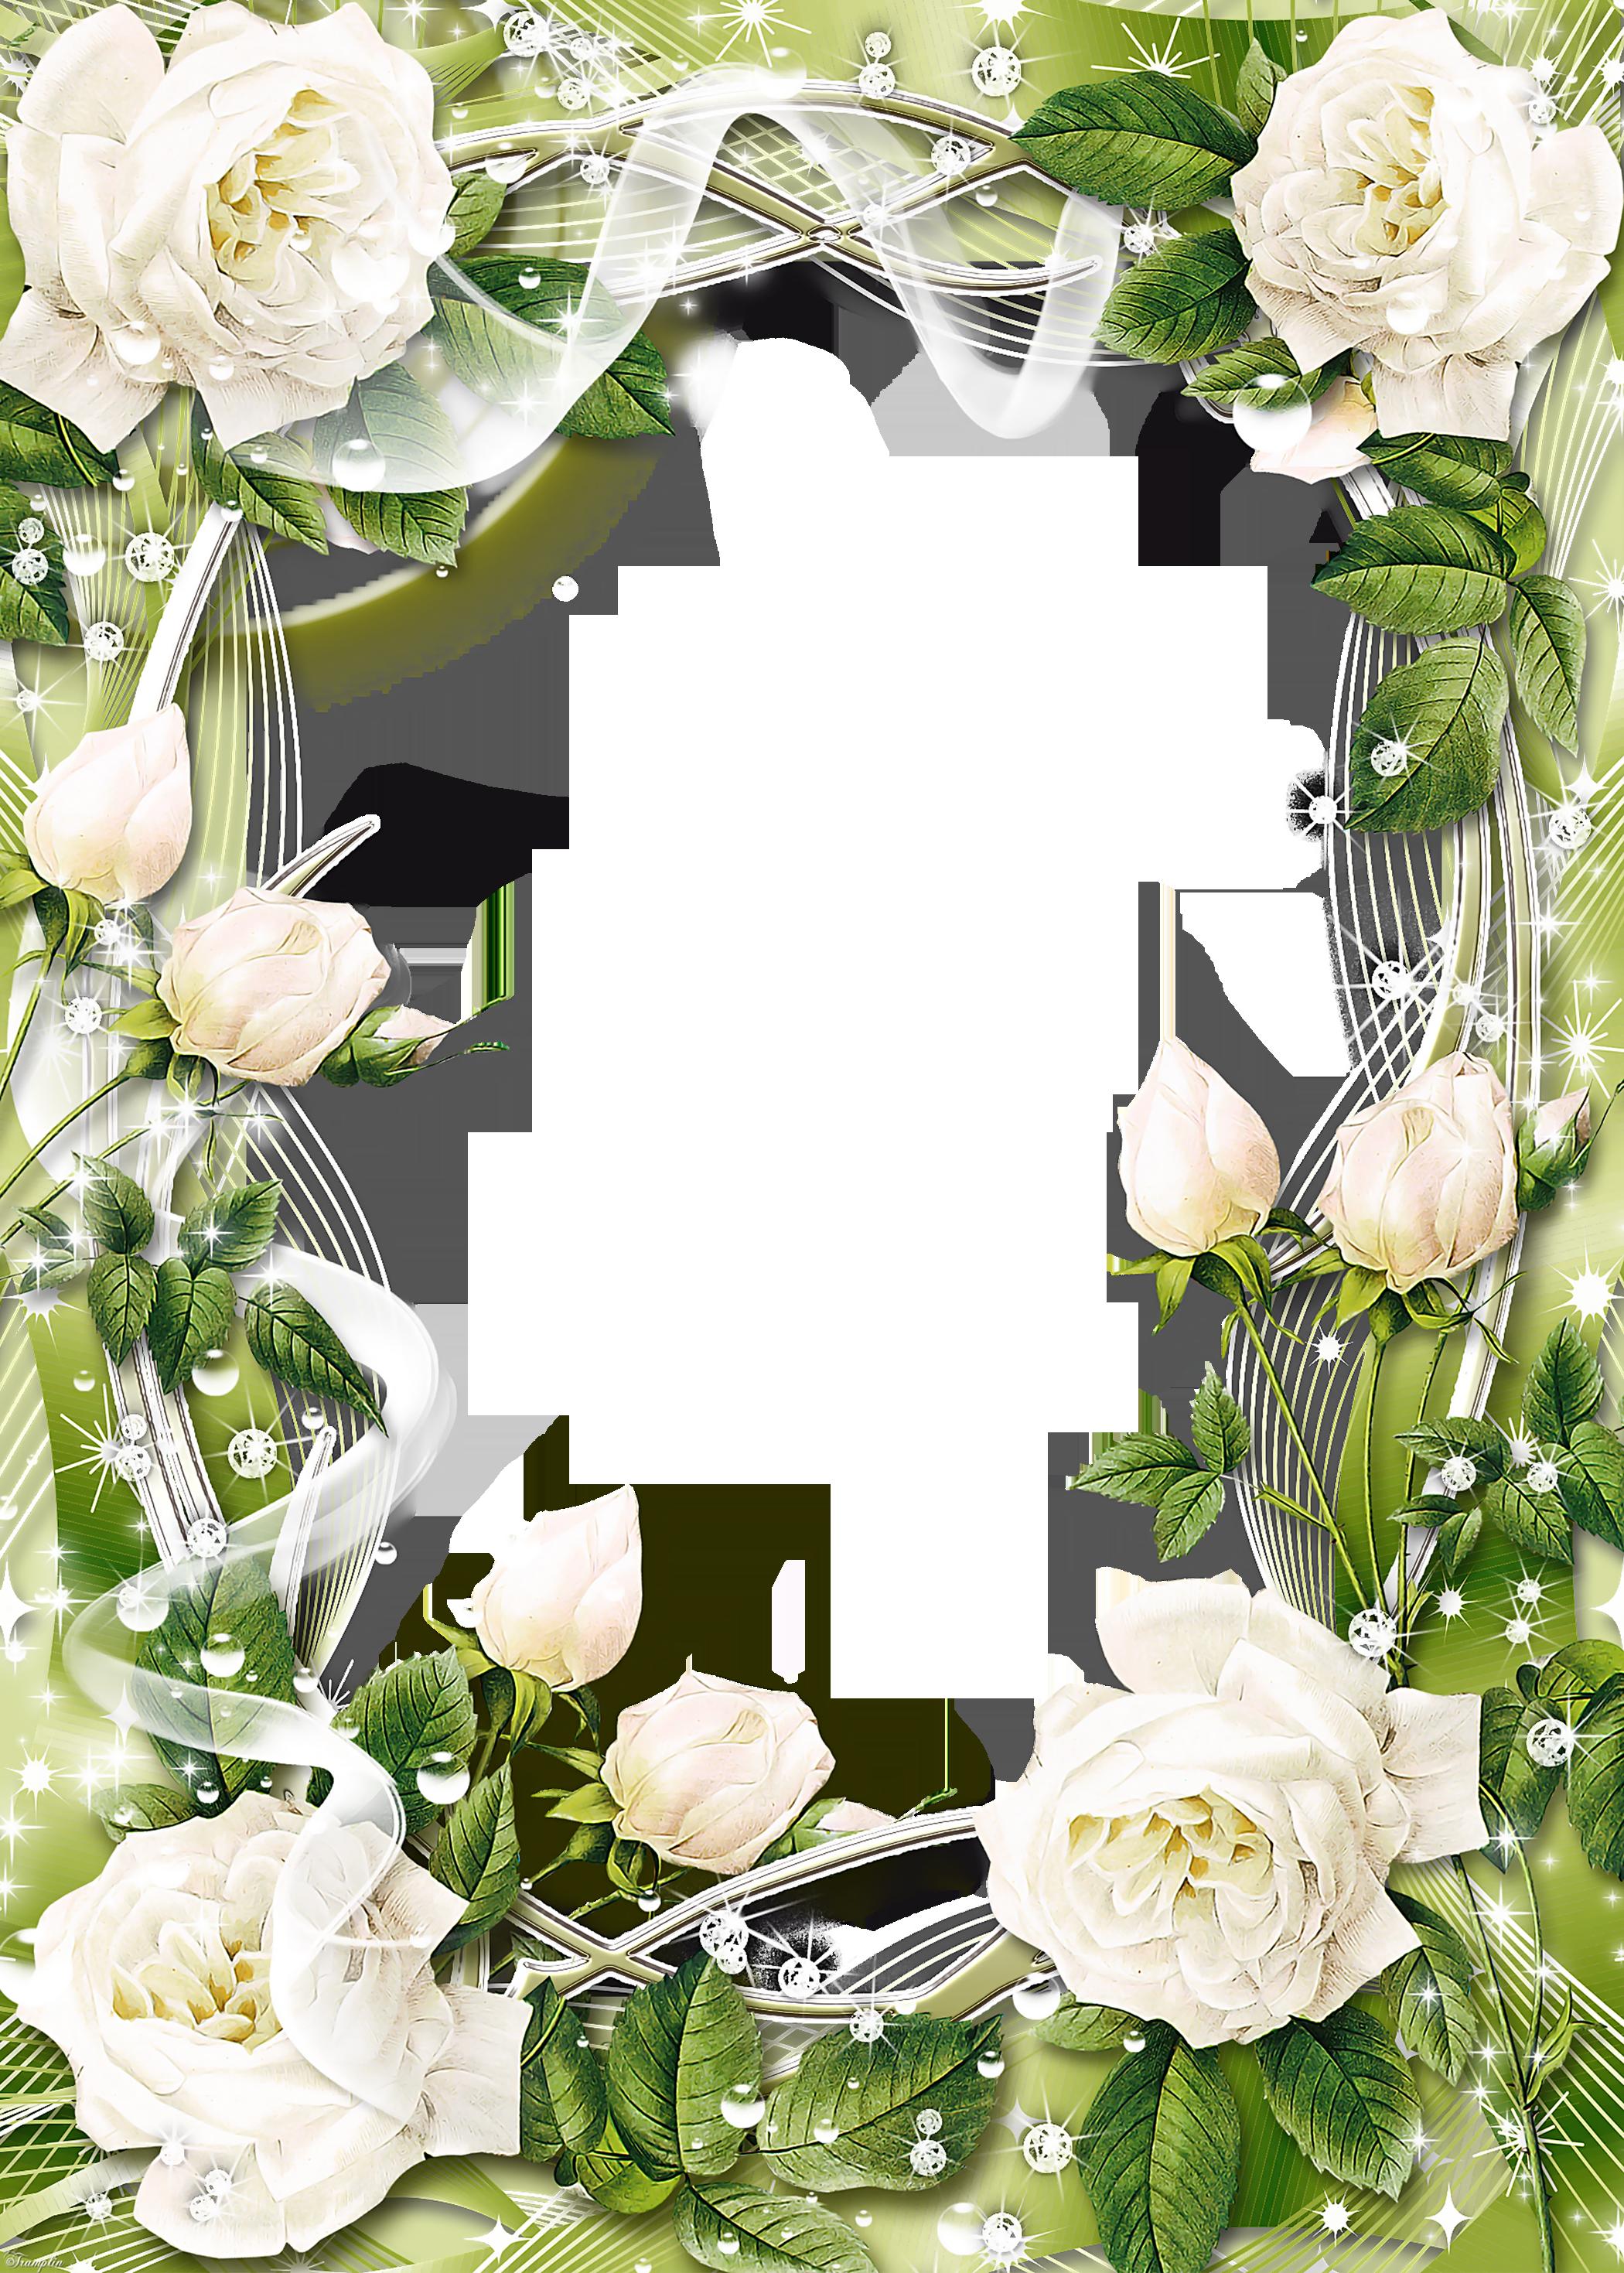 Flower border design clipart free download Groen Transparant PNG fotolijst met Witte Rozen   clipart borders ... free download